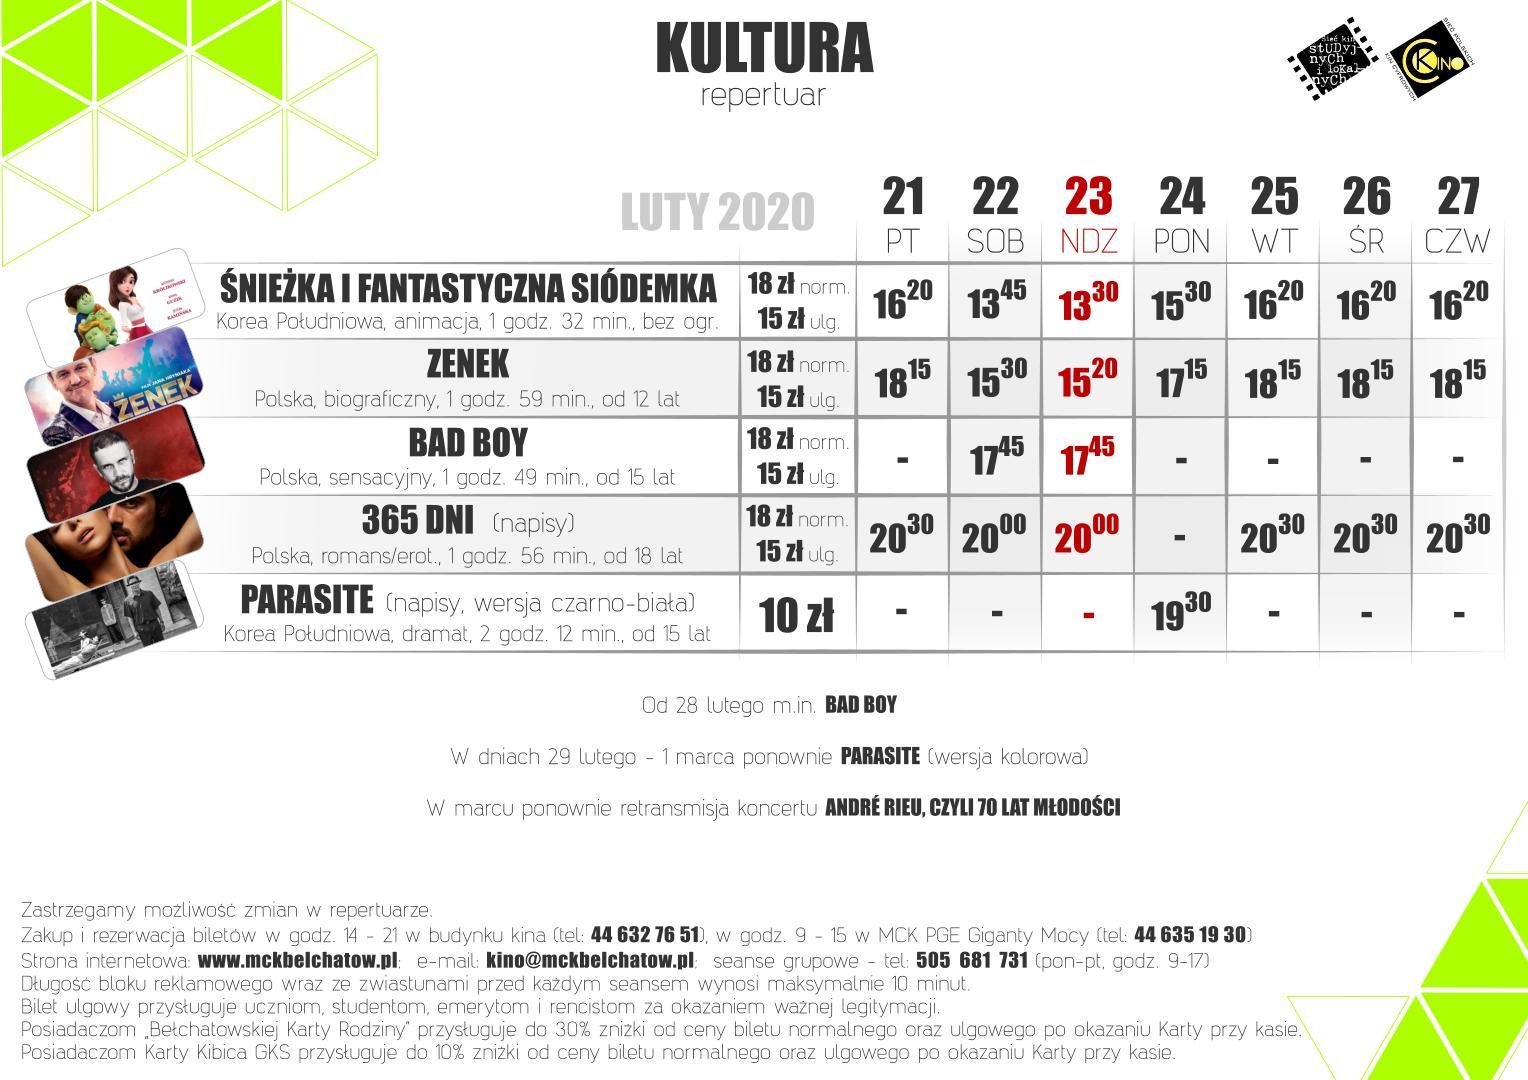 https://www.mckbelchatow.pl/kino-kultura/repertuar/2020/02/3/kultura-repertuar-2020-02-21_ekran.jpg